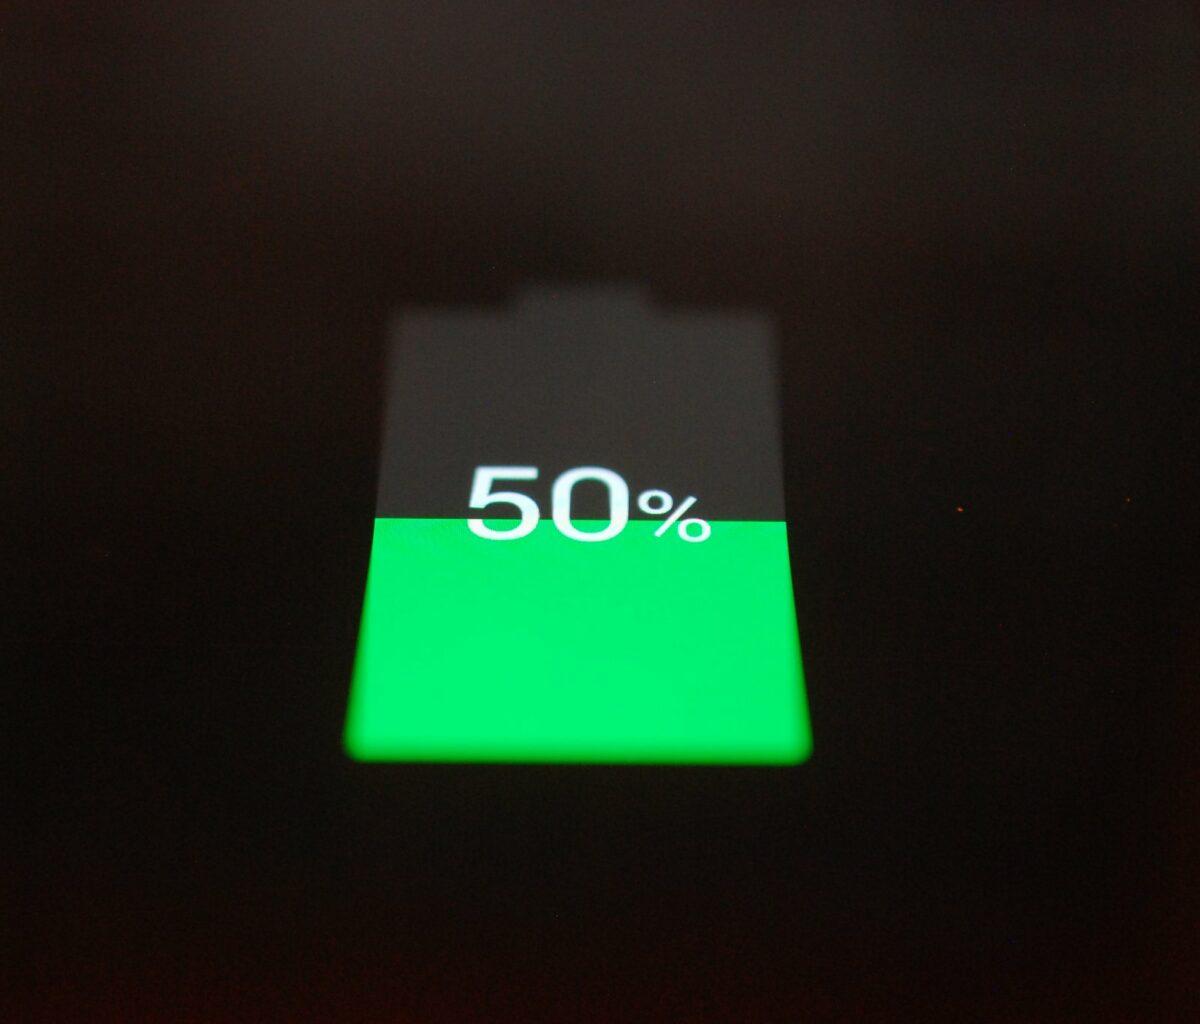 Akku-Anzeige bei 50 Prozent